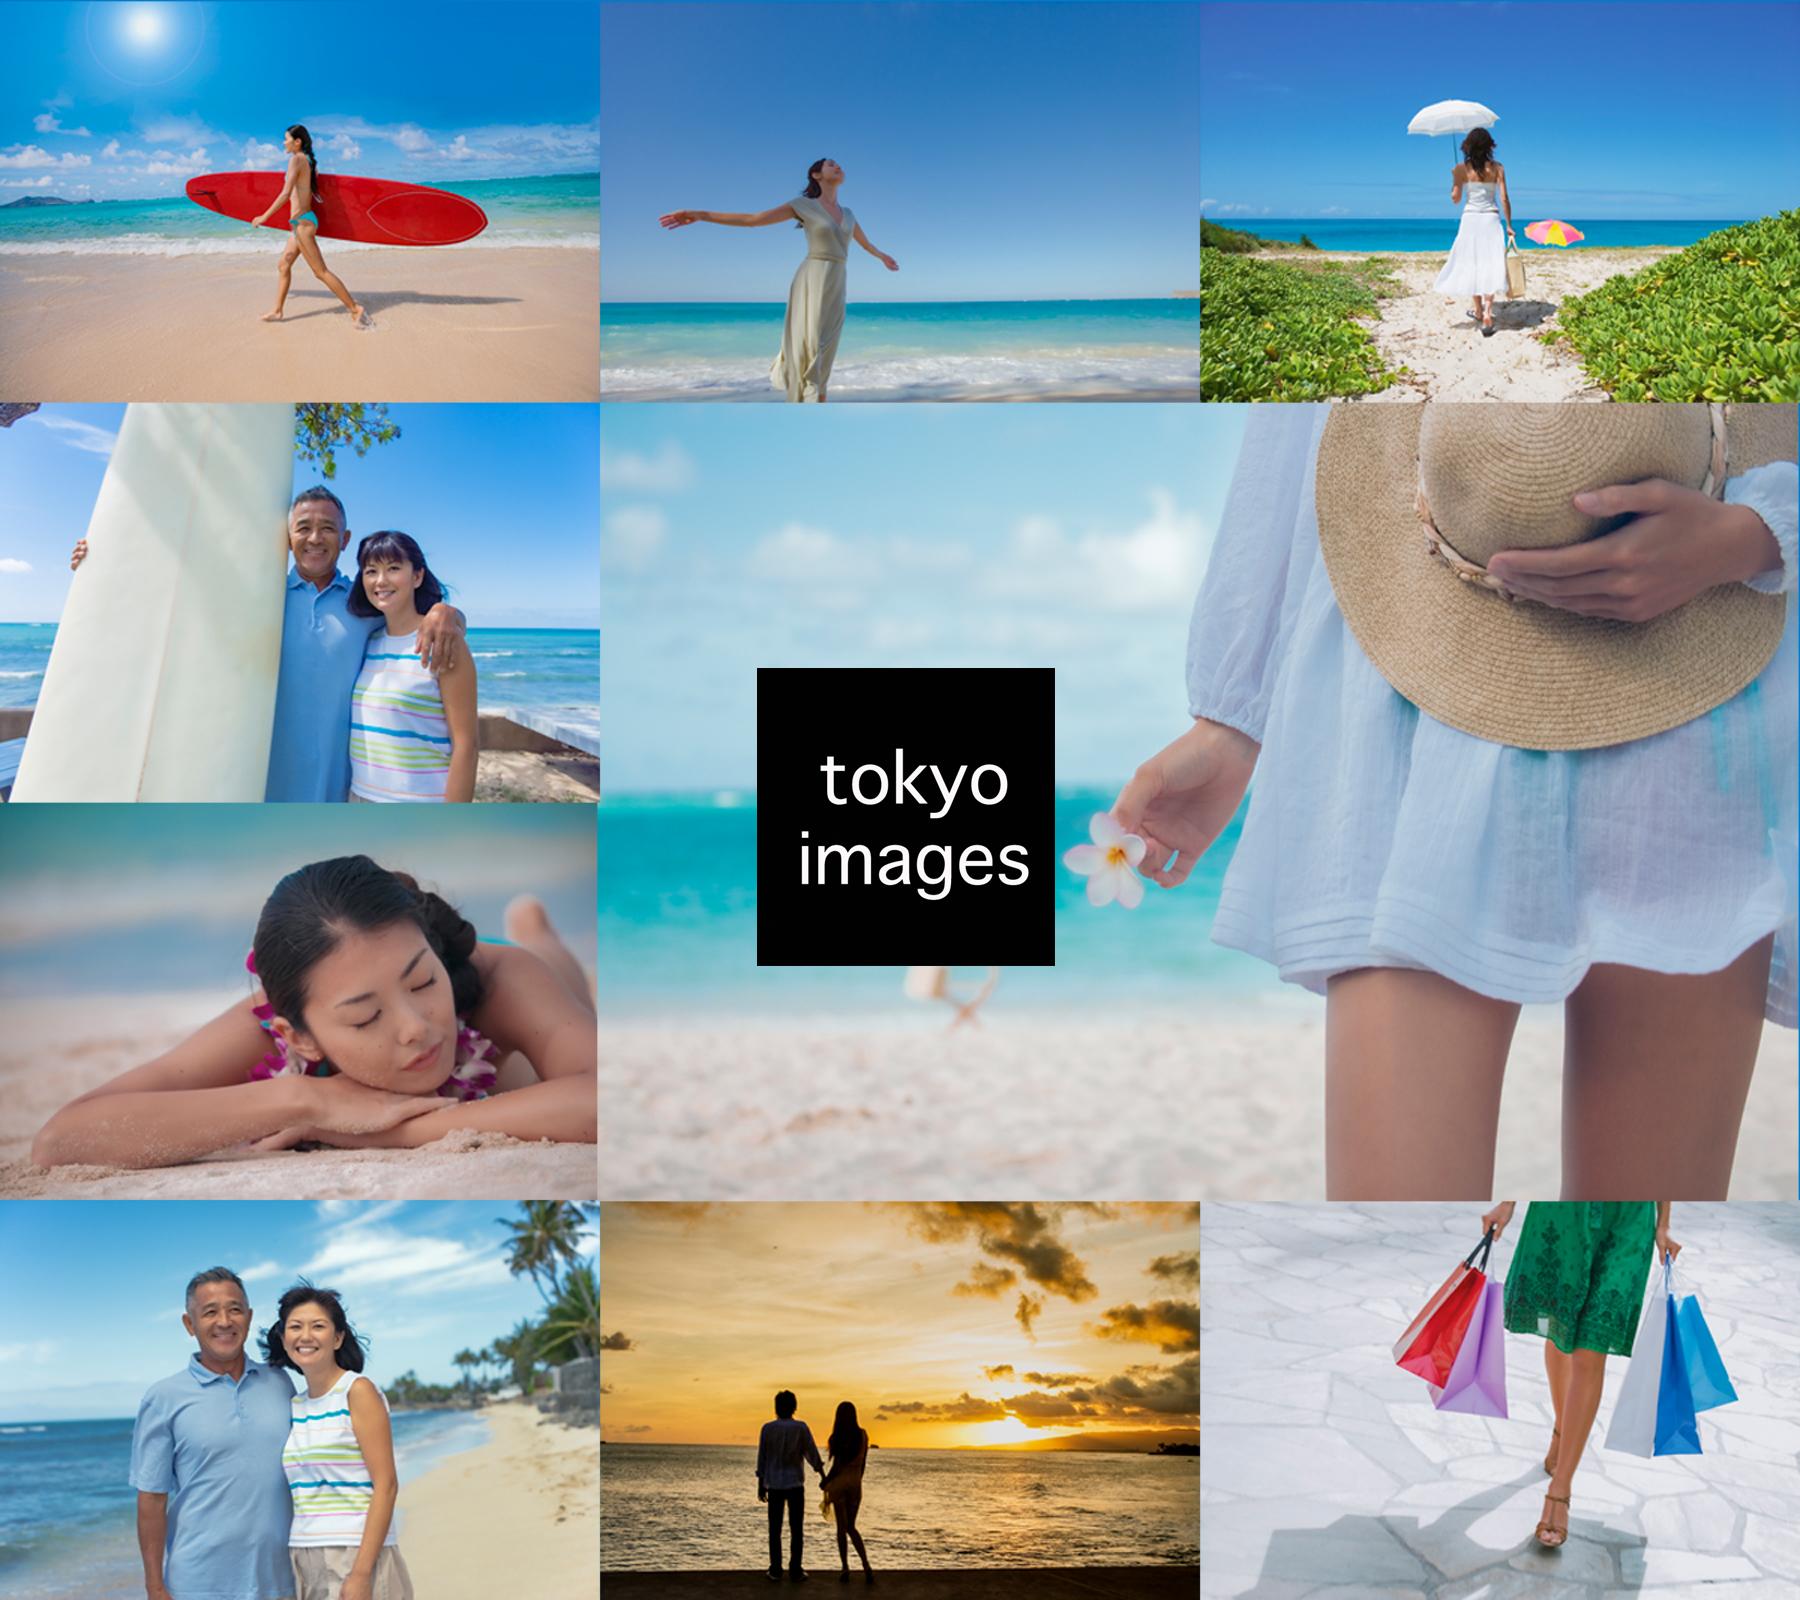 tokyoimages stock